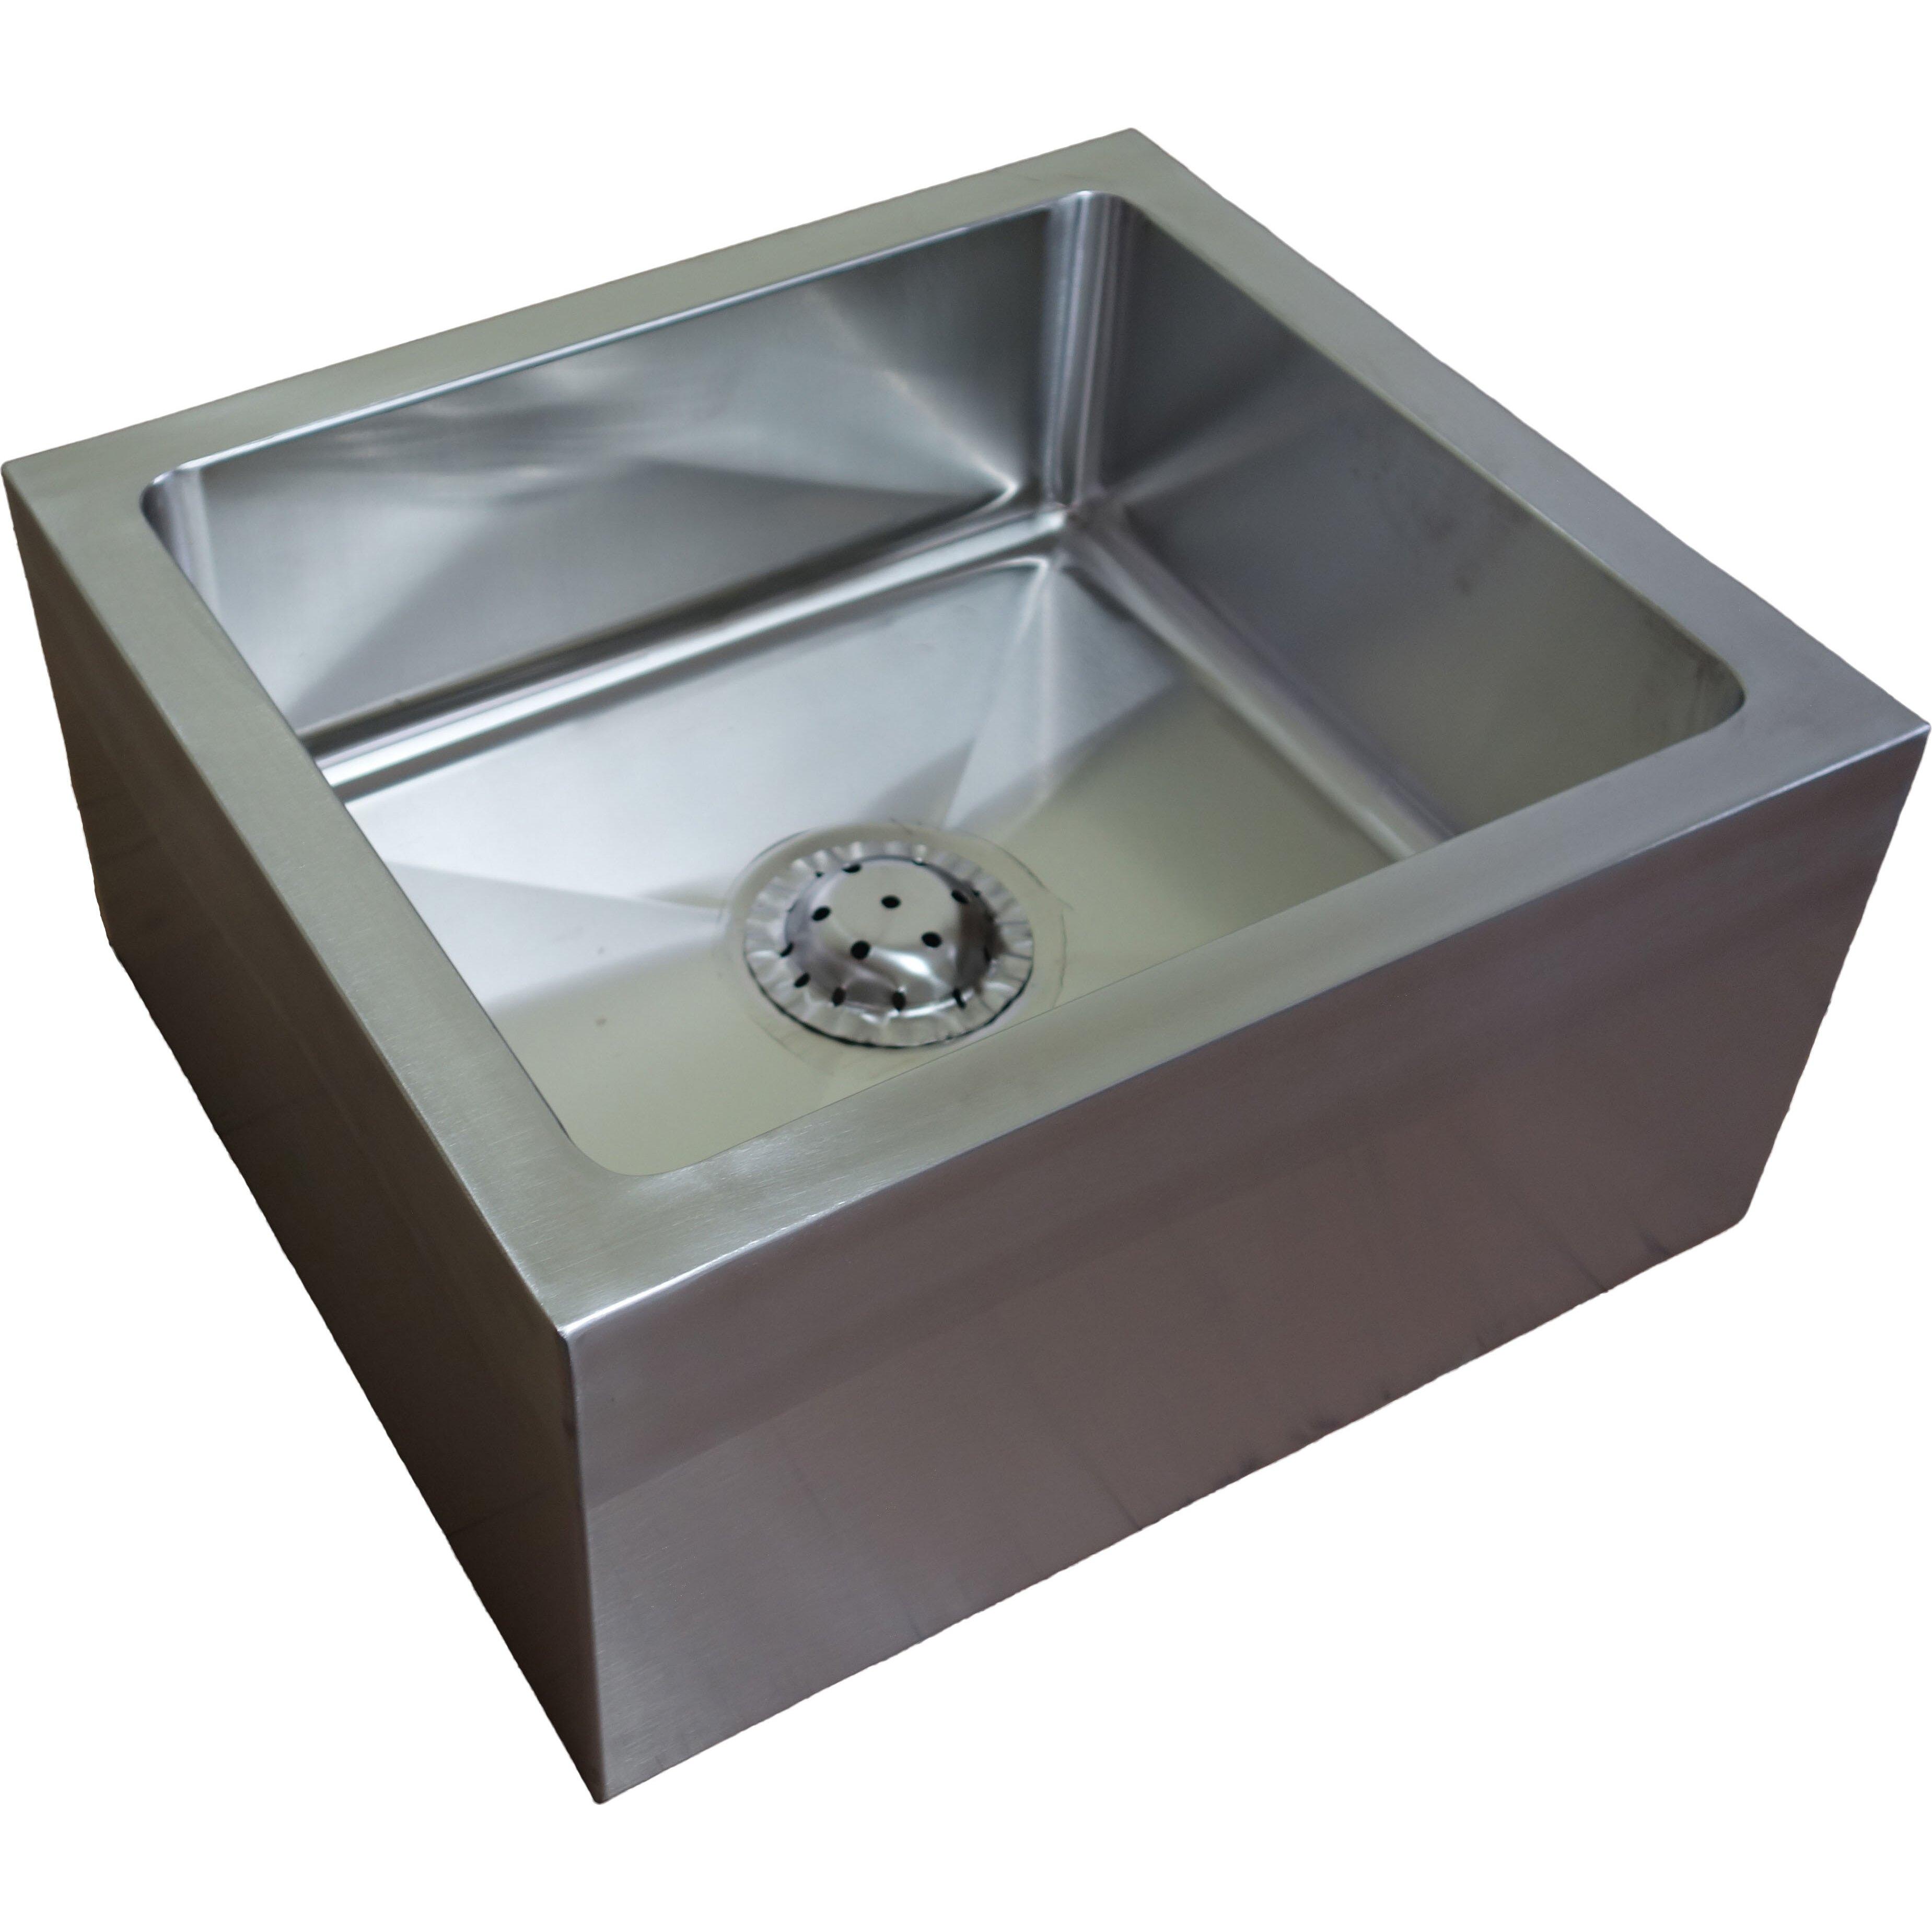 18 X 18 Utility Sink : 18